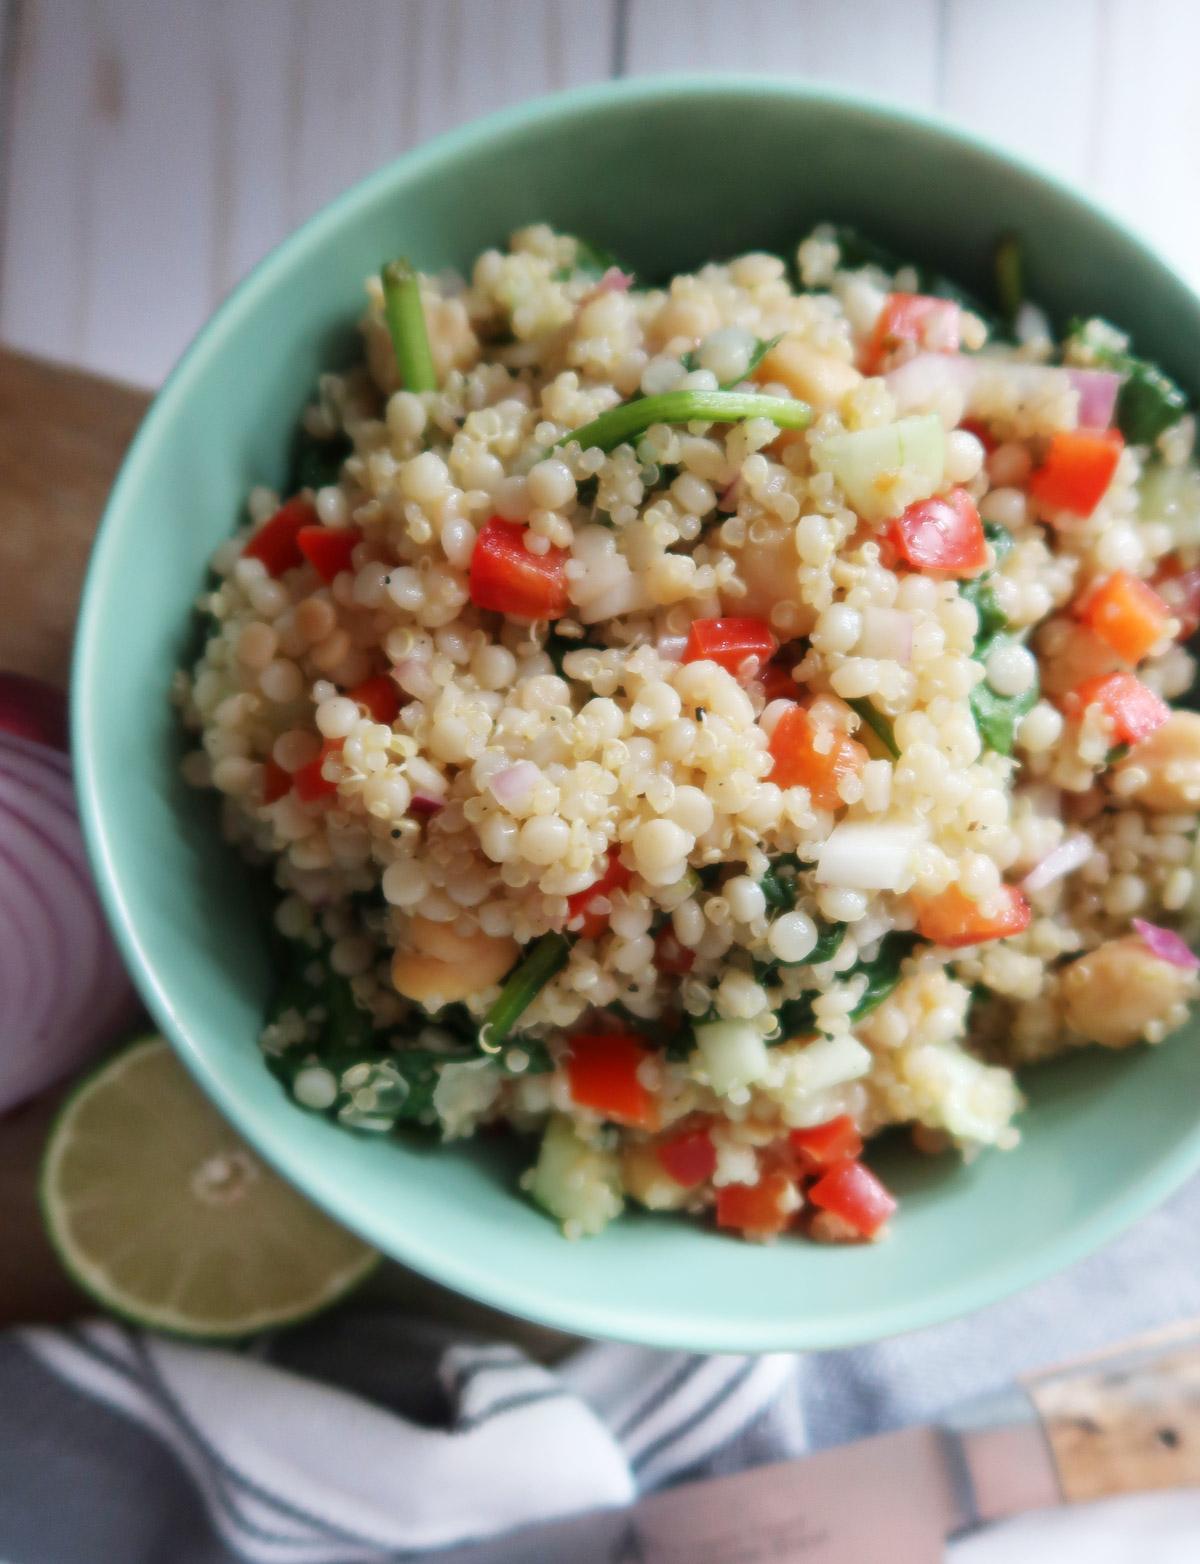 Couscous and Quinoa Salad